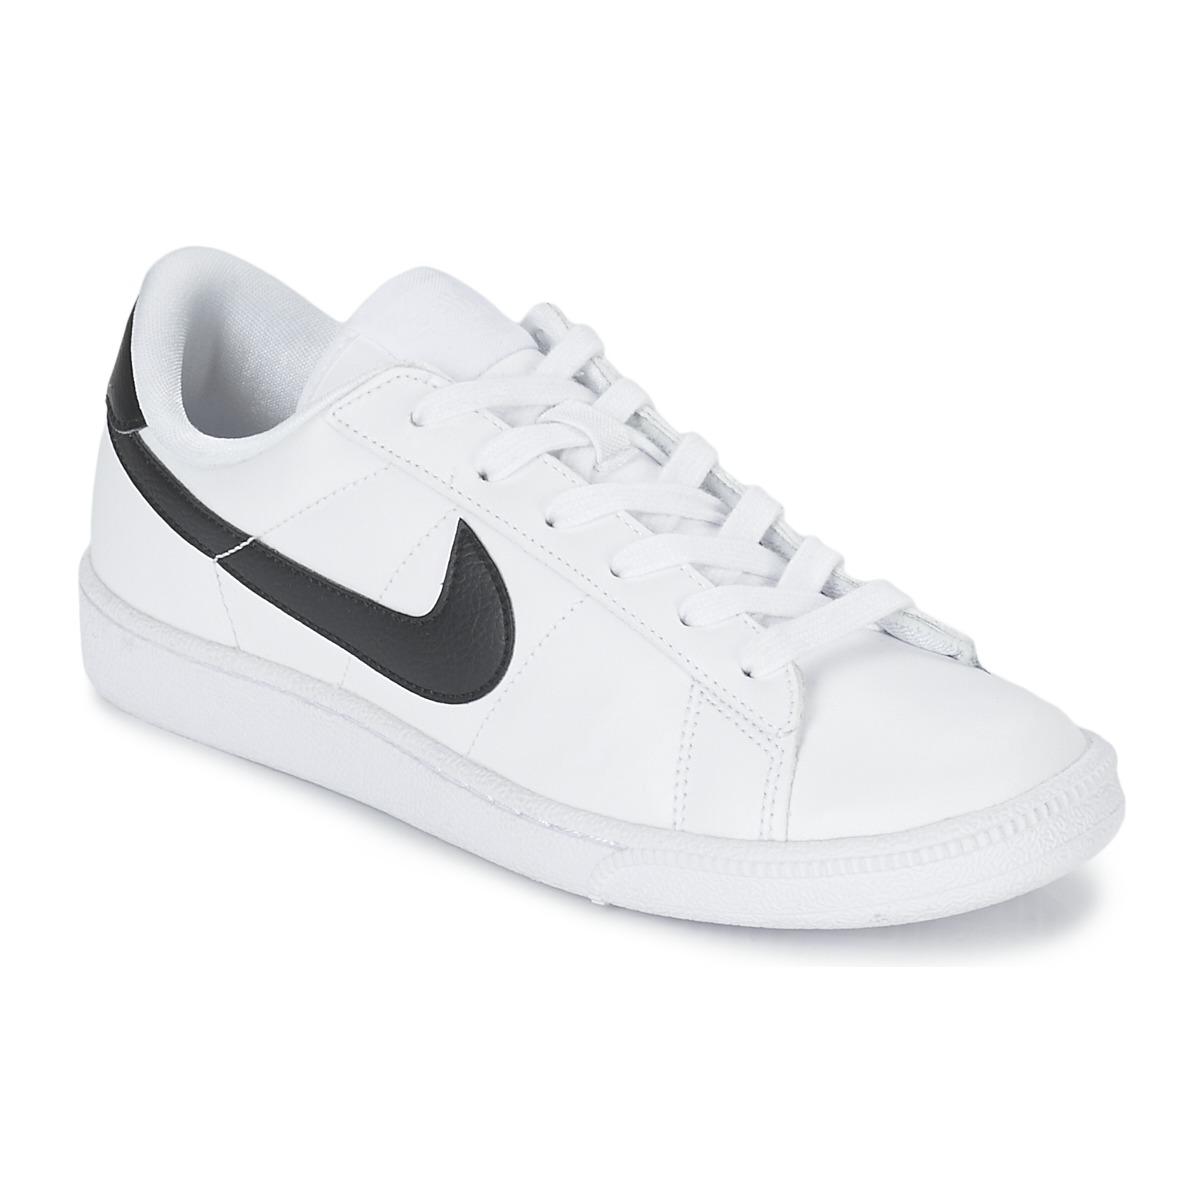 nike tennis classic grise